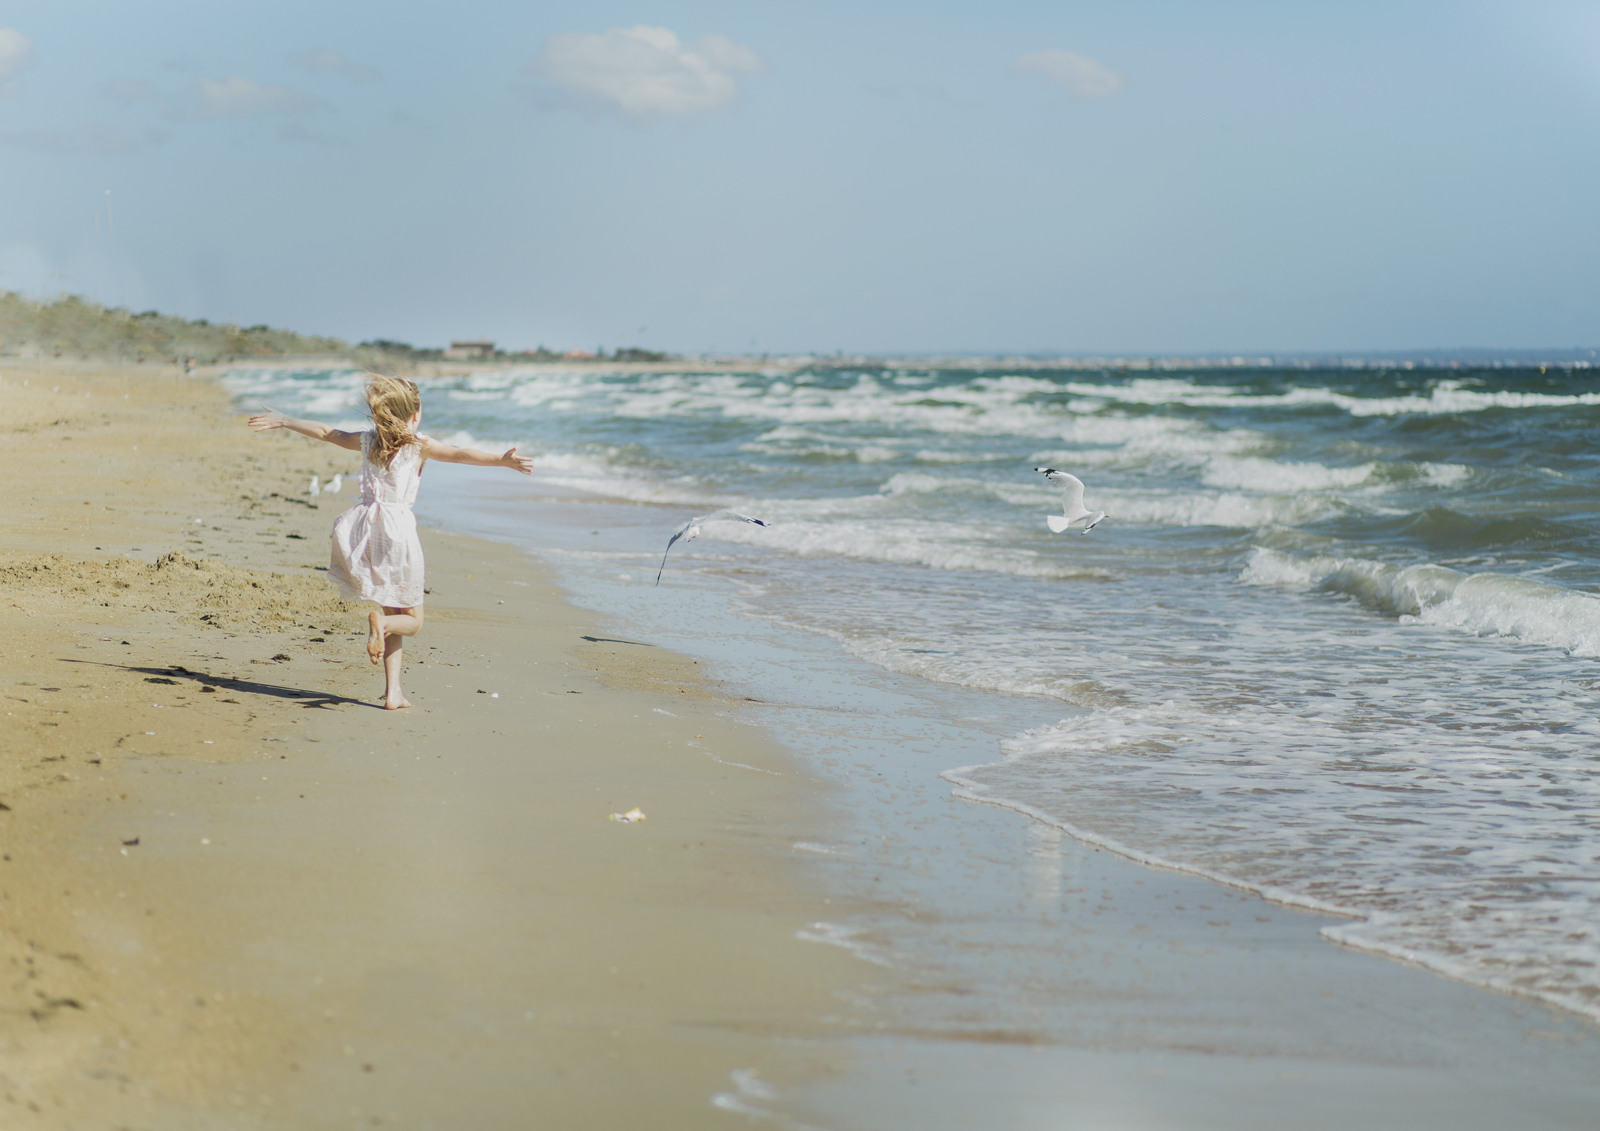 Tween girl chasing seagulls at the beach